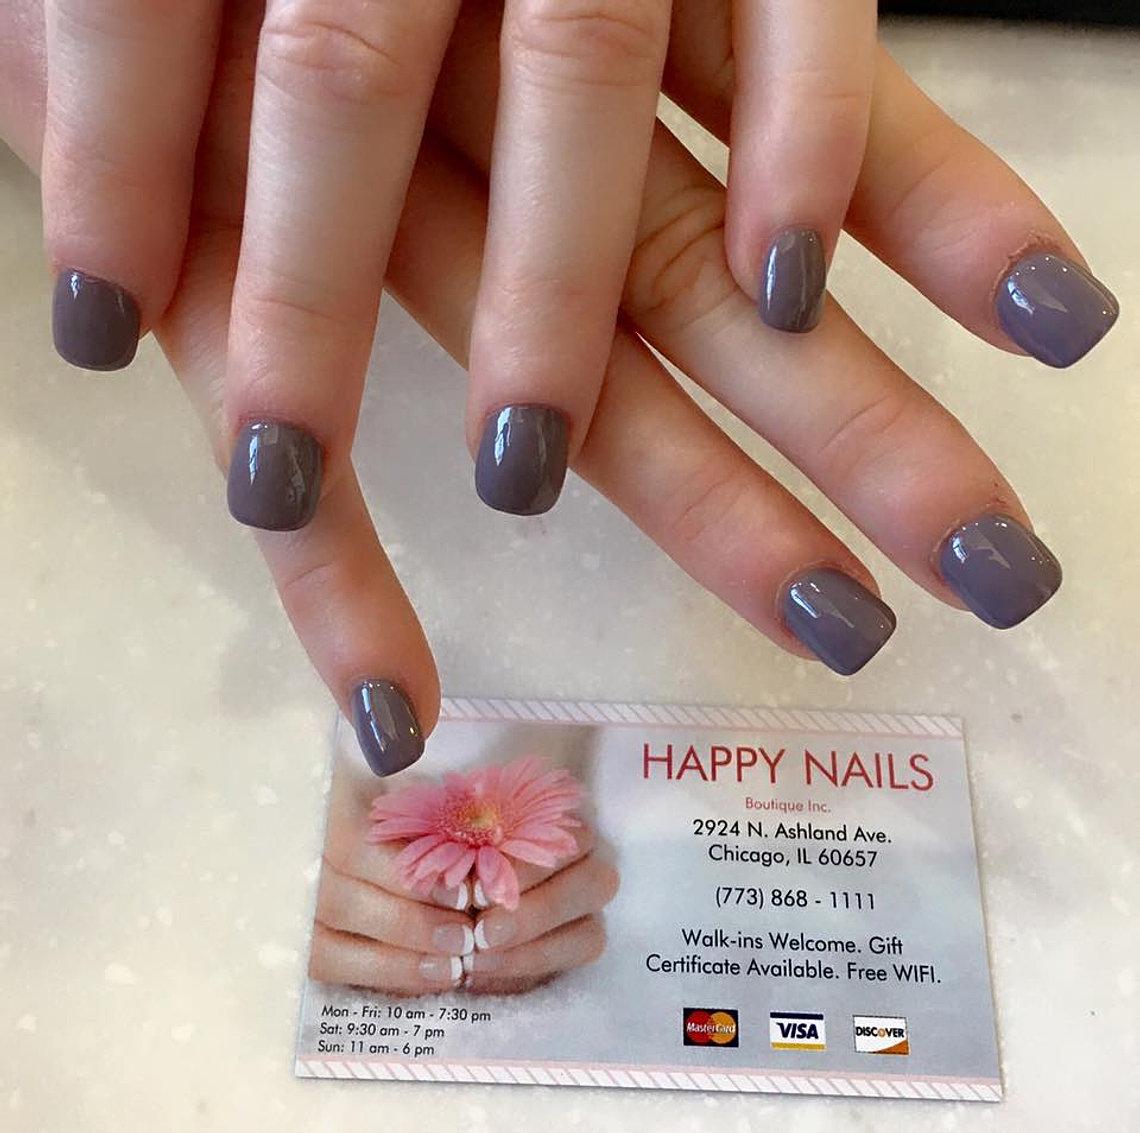 Home | Happy Nails Boutique